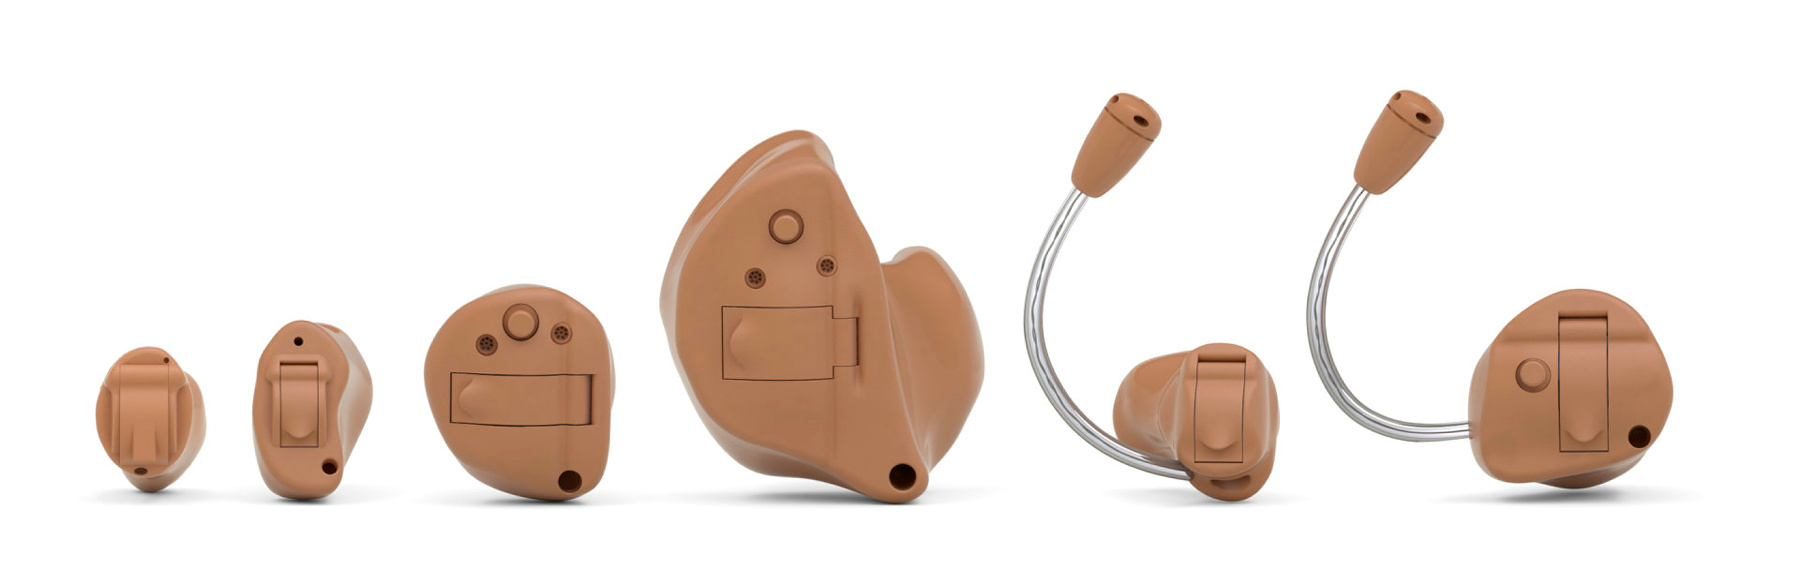 Carmarthen Hearing Aids ReSound LiNX 3D custom